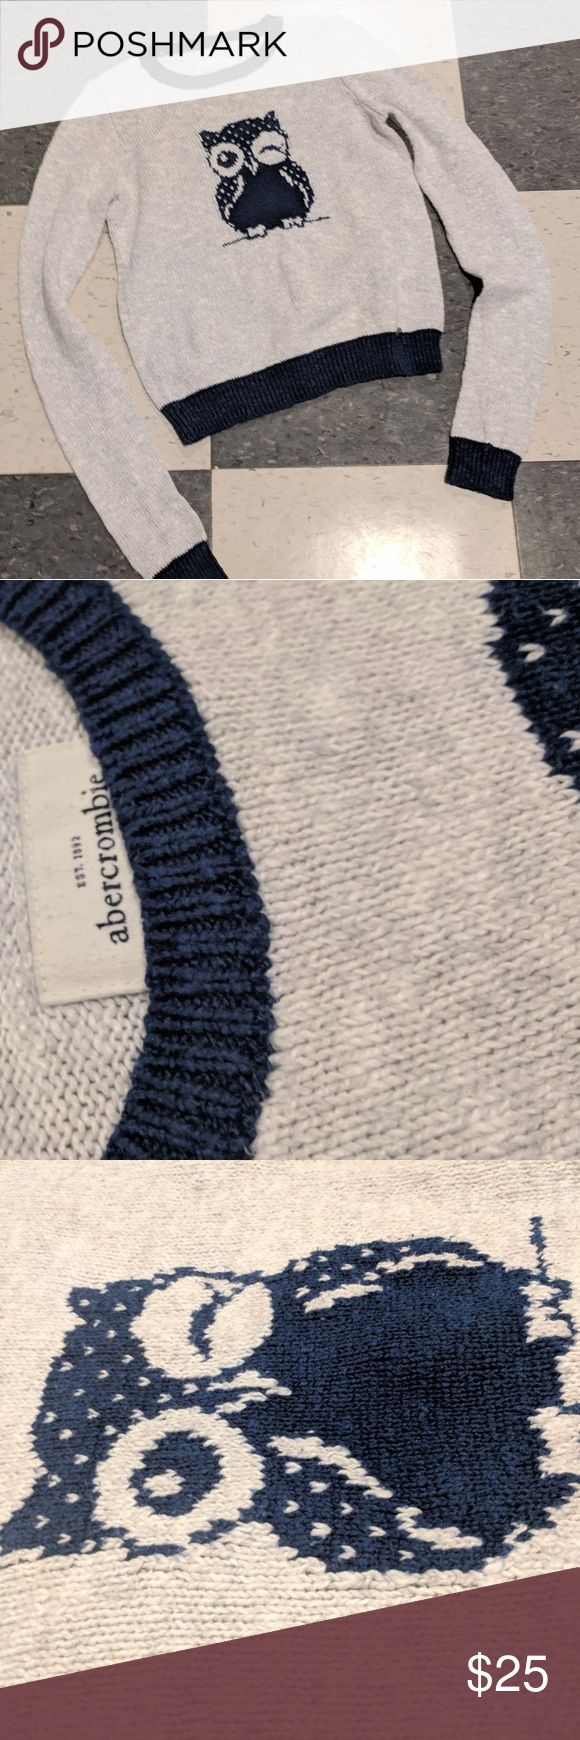 🦉 Abercrombie Kids girls medium Abercrombie Kids girls medium owl sweater Abercombie Kids Shirts & Tops Sweaters